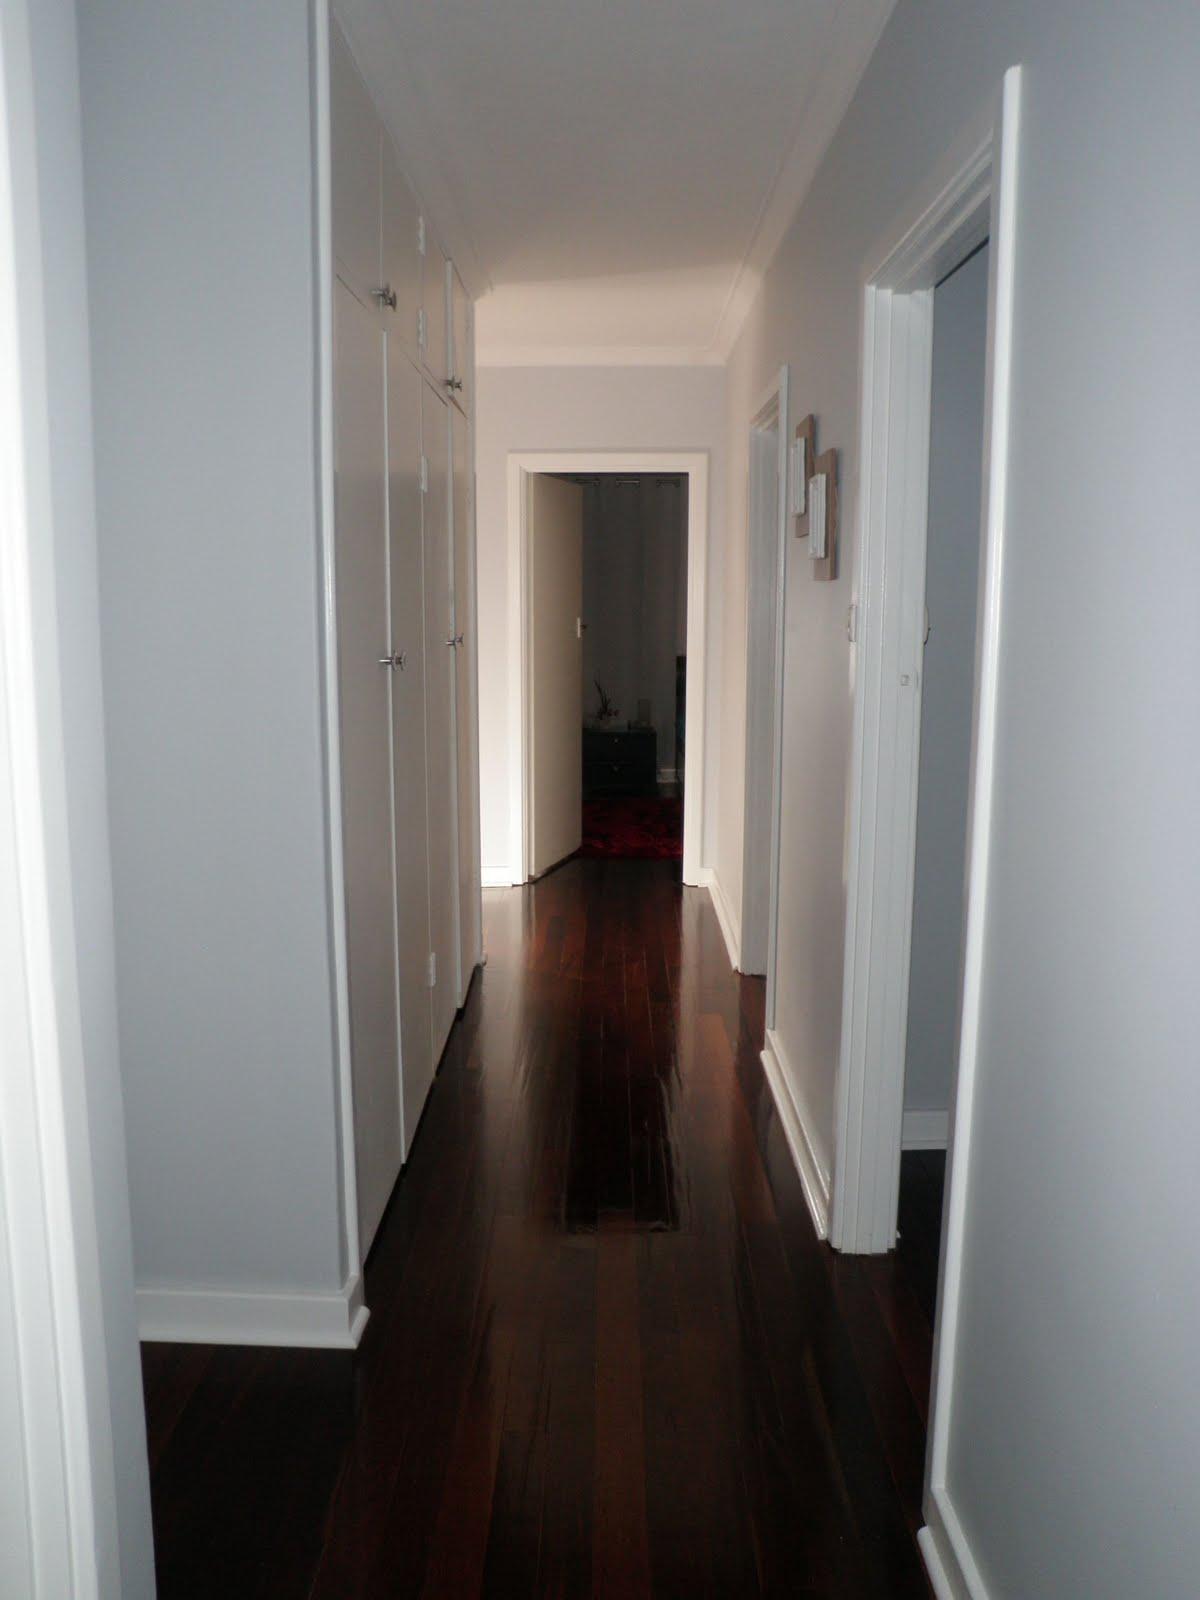 http://2.bp.blogspot.com/-d_Km3WMlyXk/TddS2DJNLQI/AAAAAAAAAwM/glPHD0eS1YQ/s1600/hallway%2Bbefore%2Blong.jpg